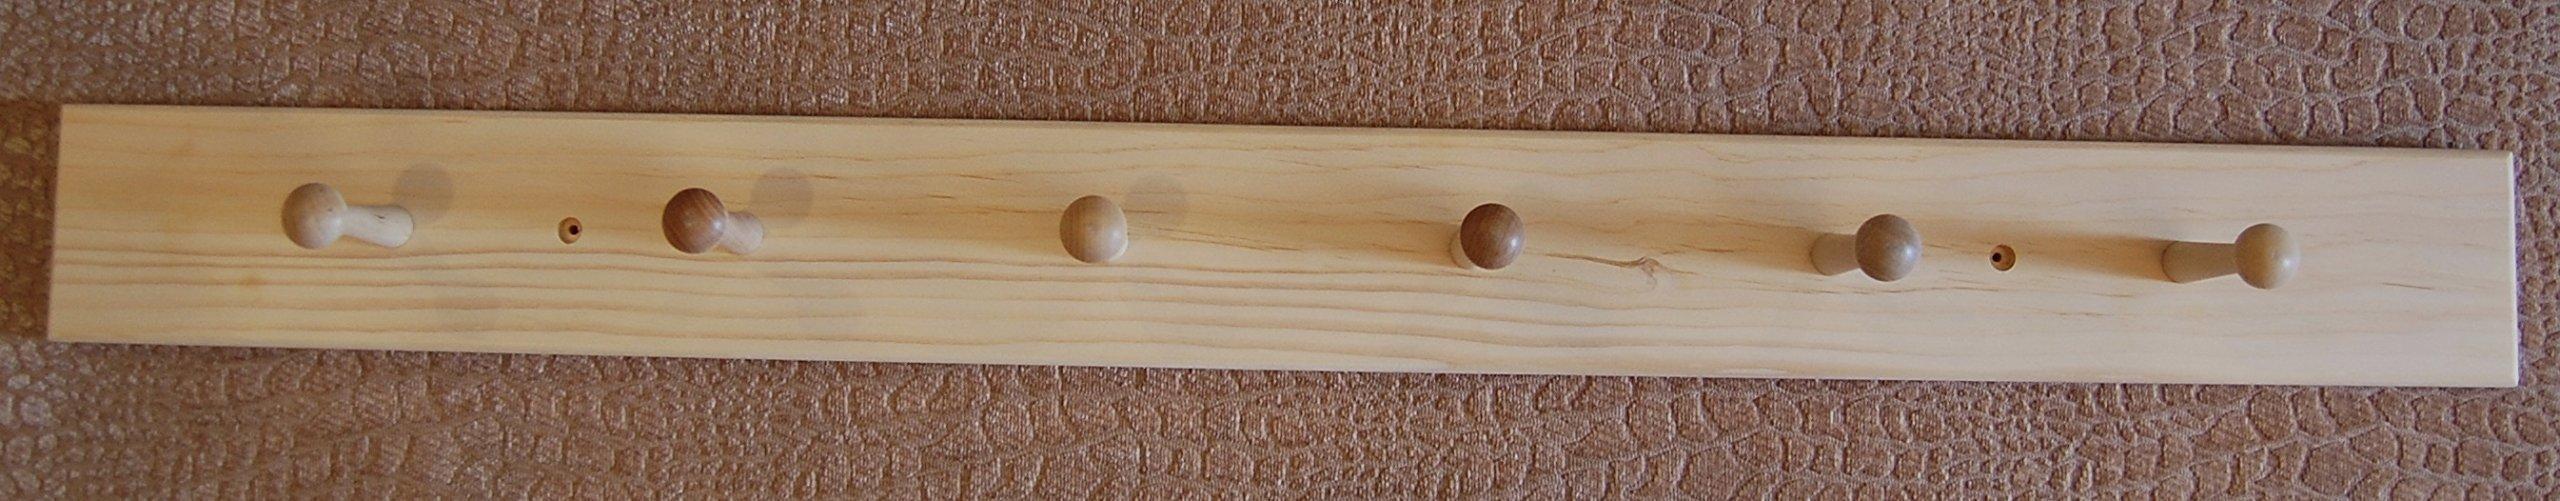 36'' unfinished pine 6 shaker peg coat rack